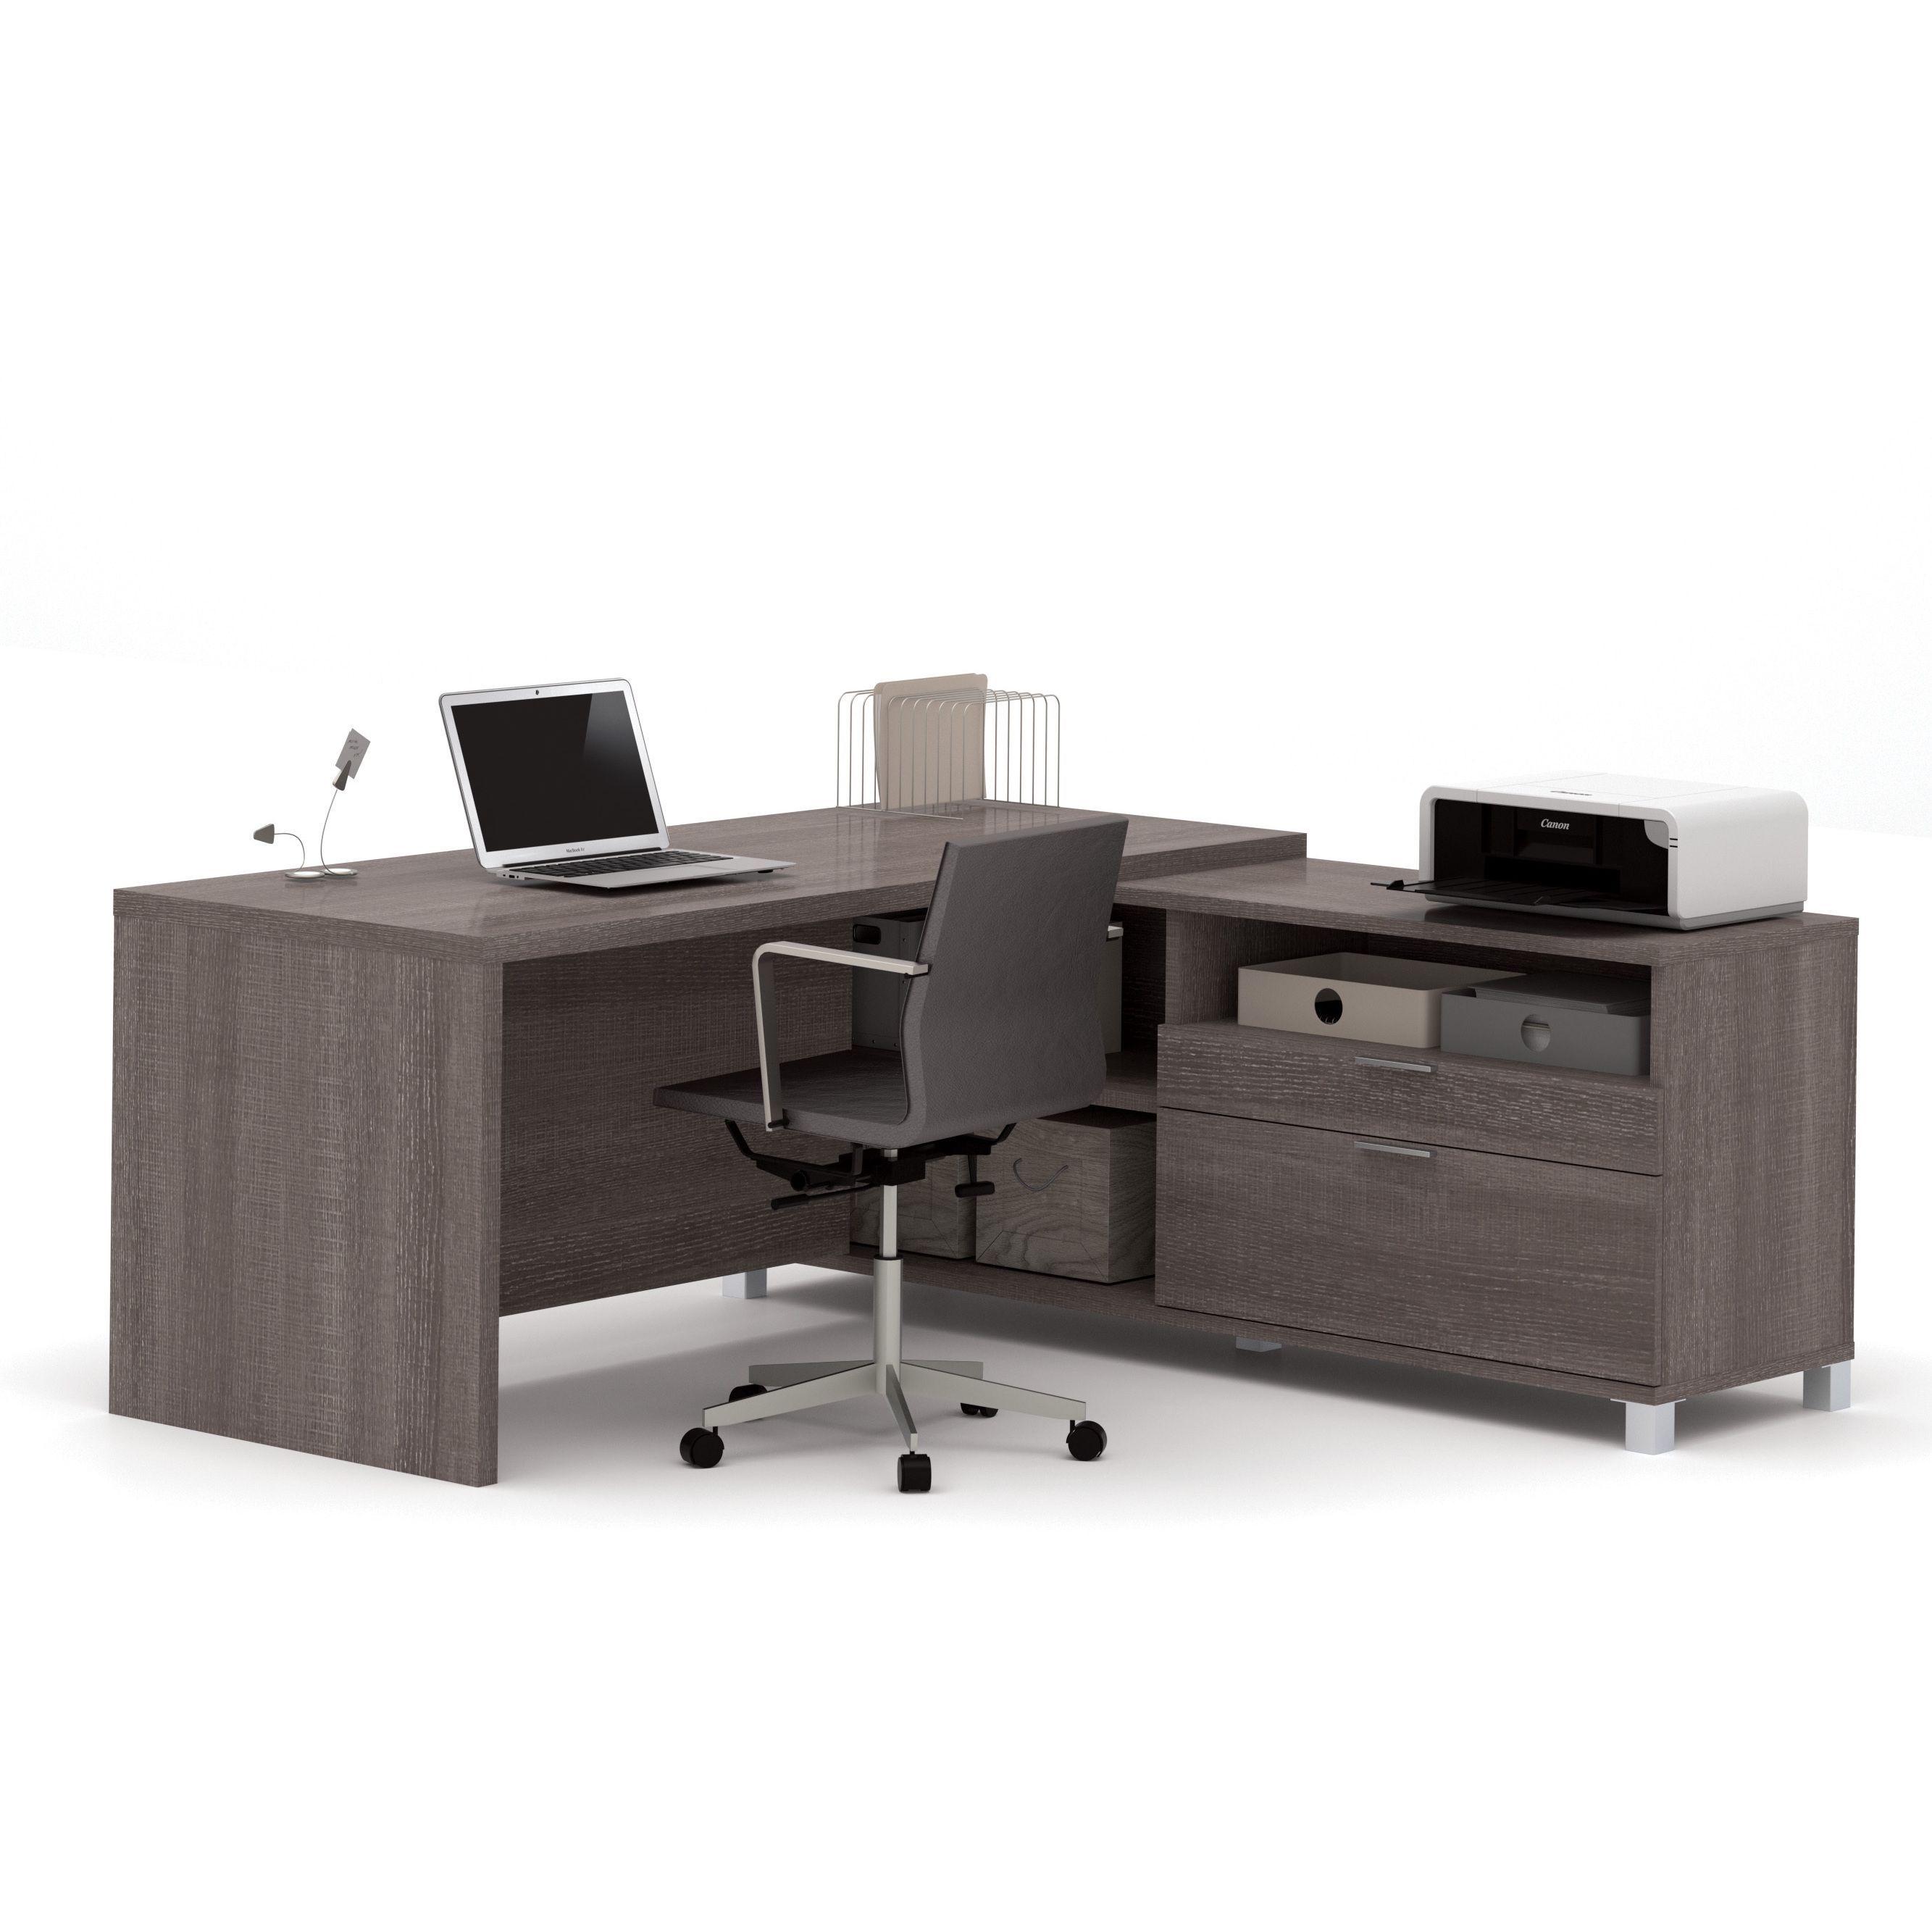 Bestar prolinea ldesk products pinterest desks office